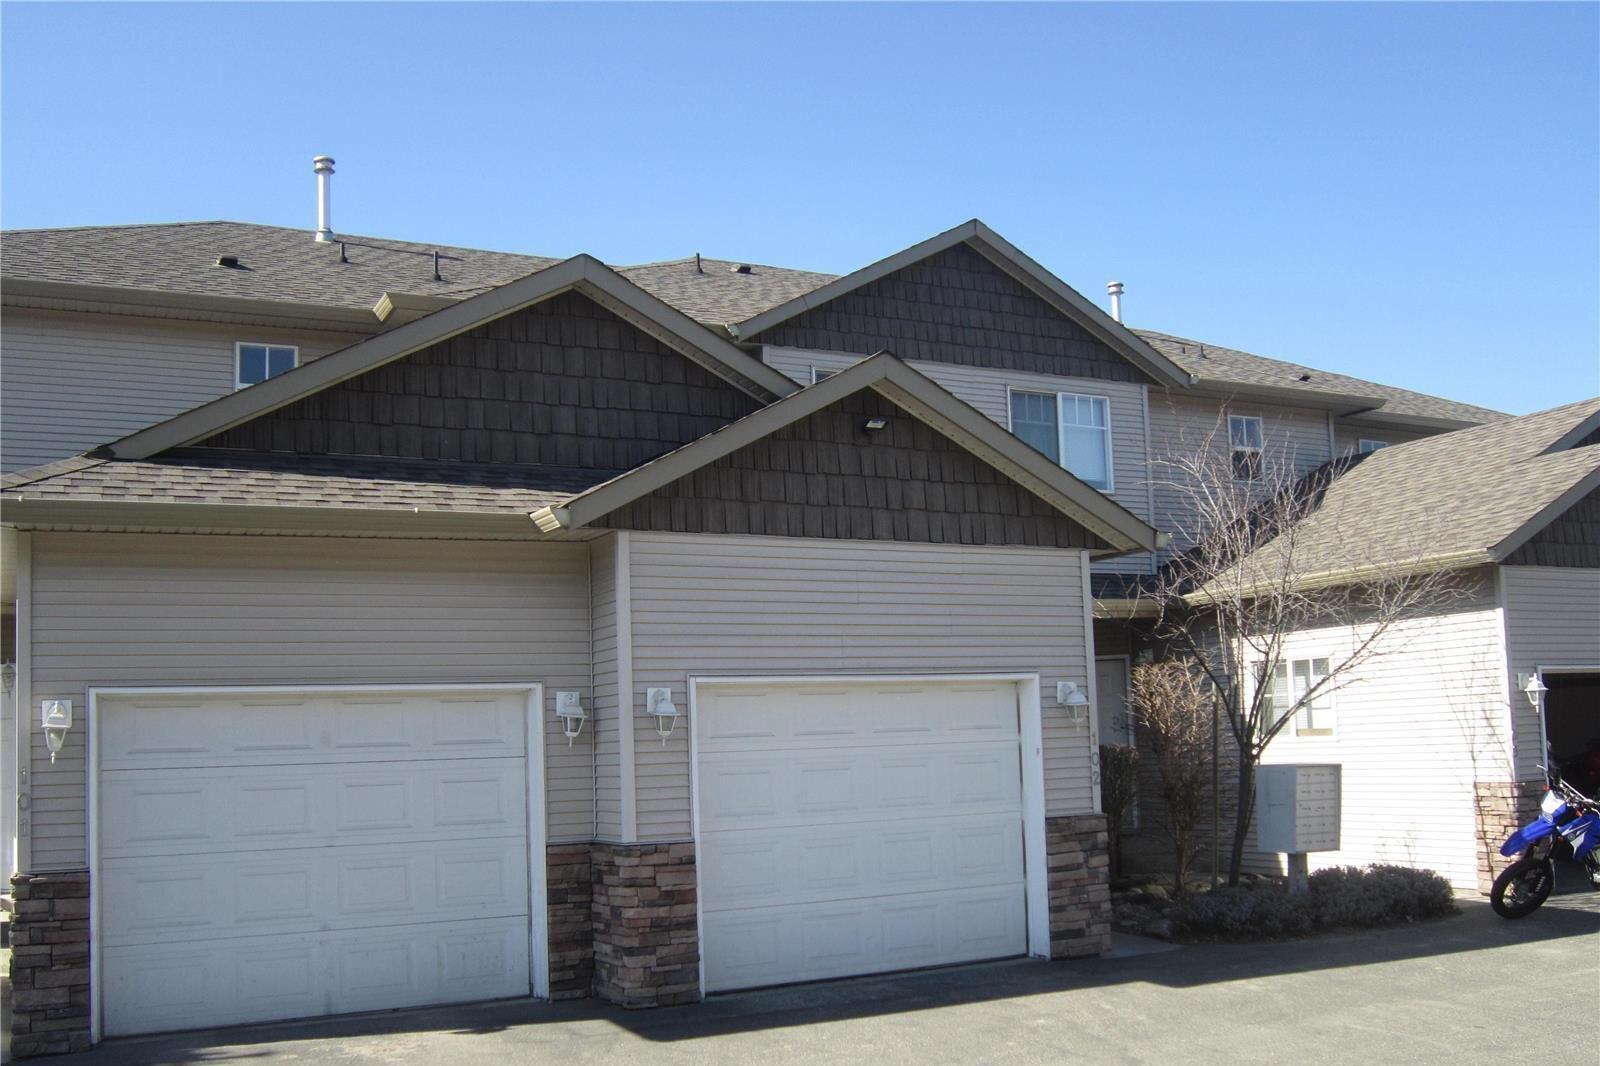 Townhouse for sale at 1420 Terai Rd Unit 102 Kelowna British Columbia - MLS: 10220773